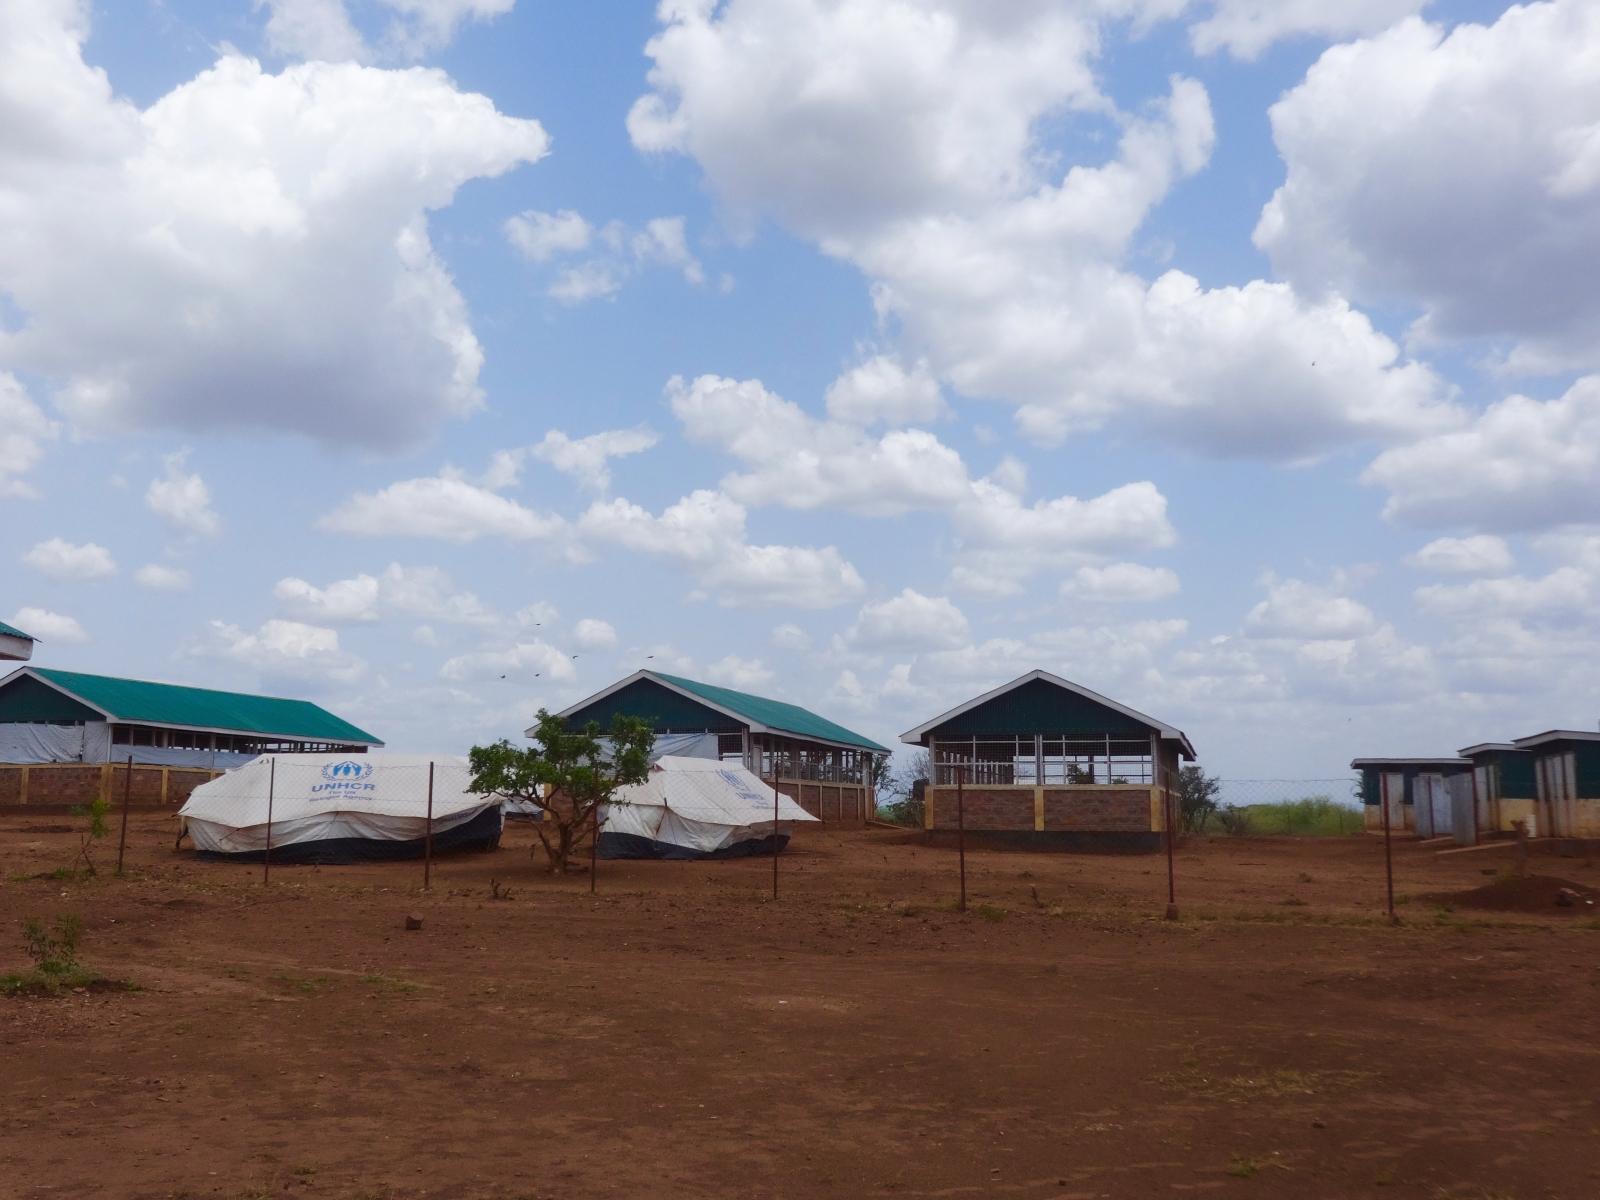 Nadapal Reception centre for asylum seekers